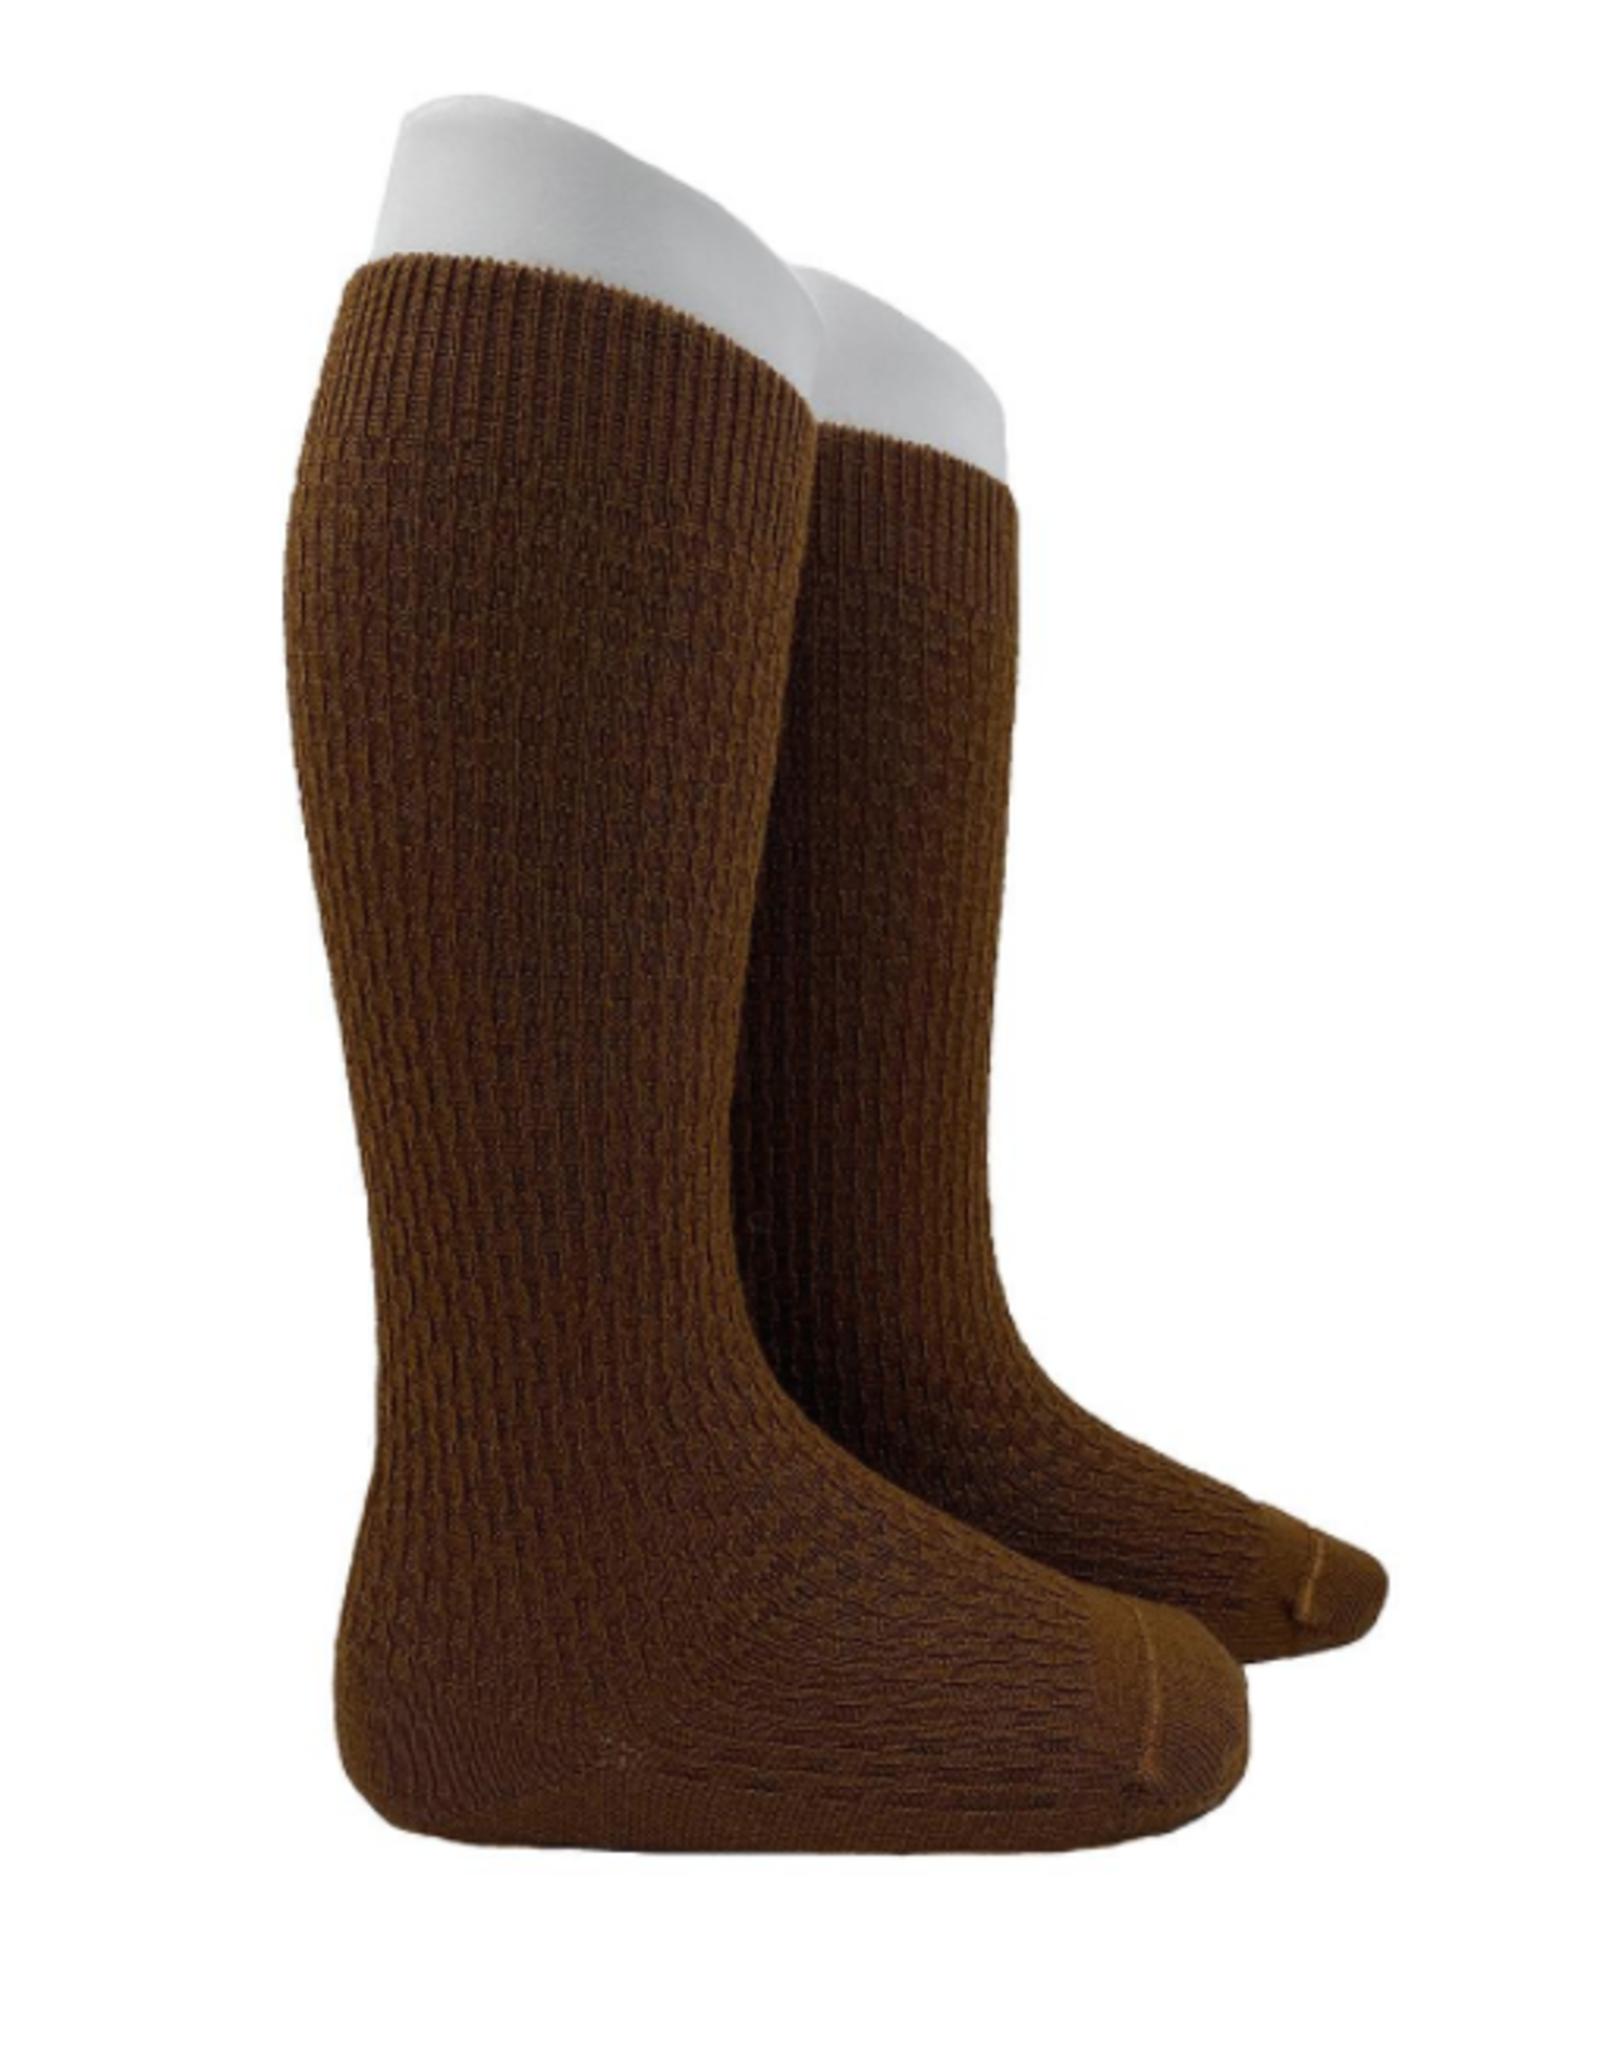 Condor Condor Wool Link Pattern Knee Sock